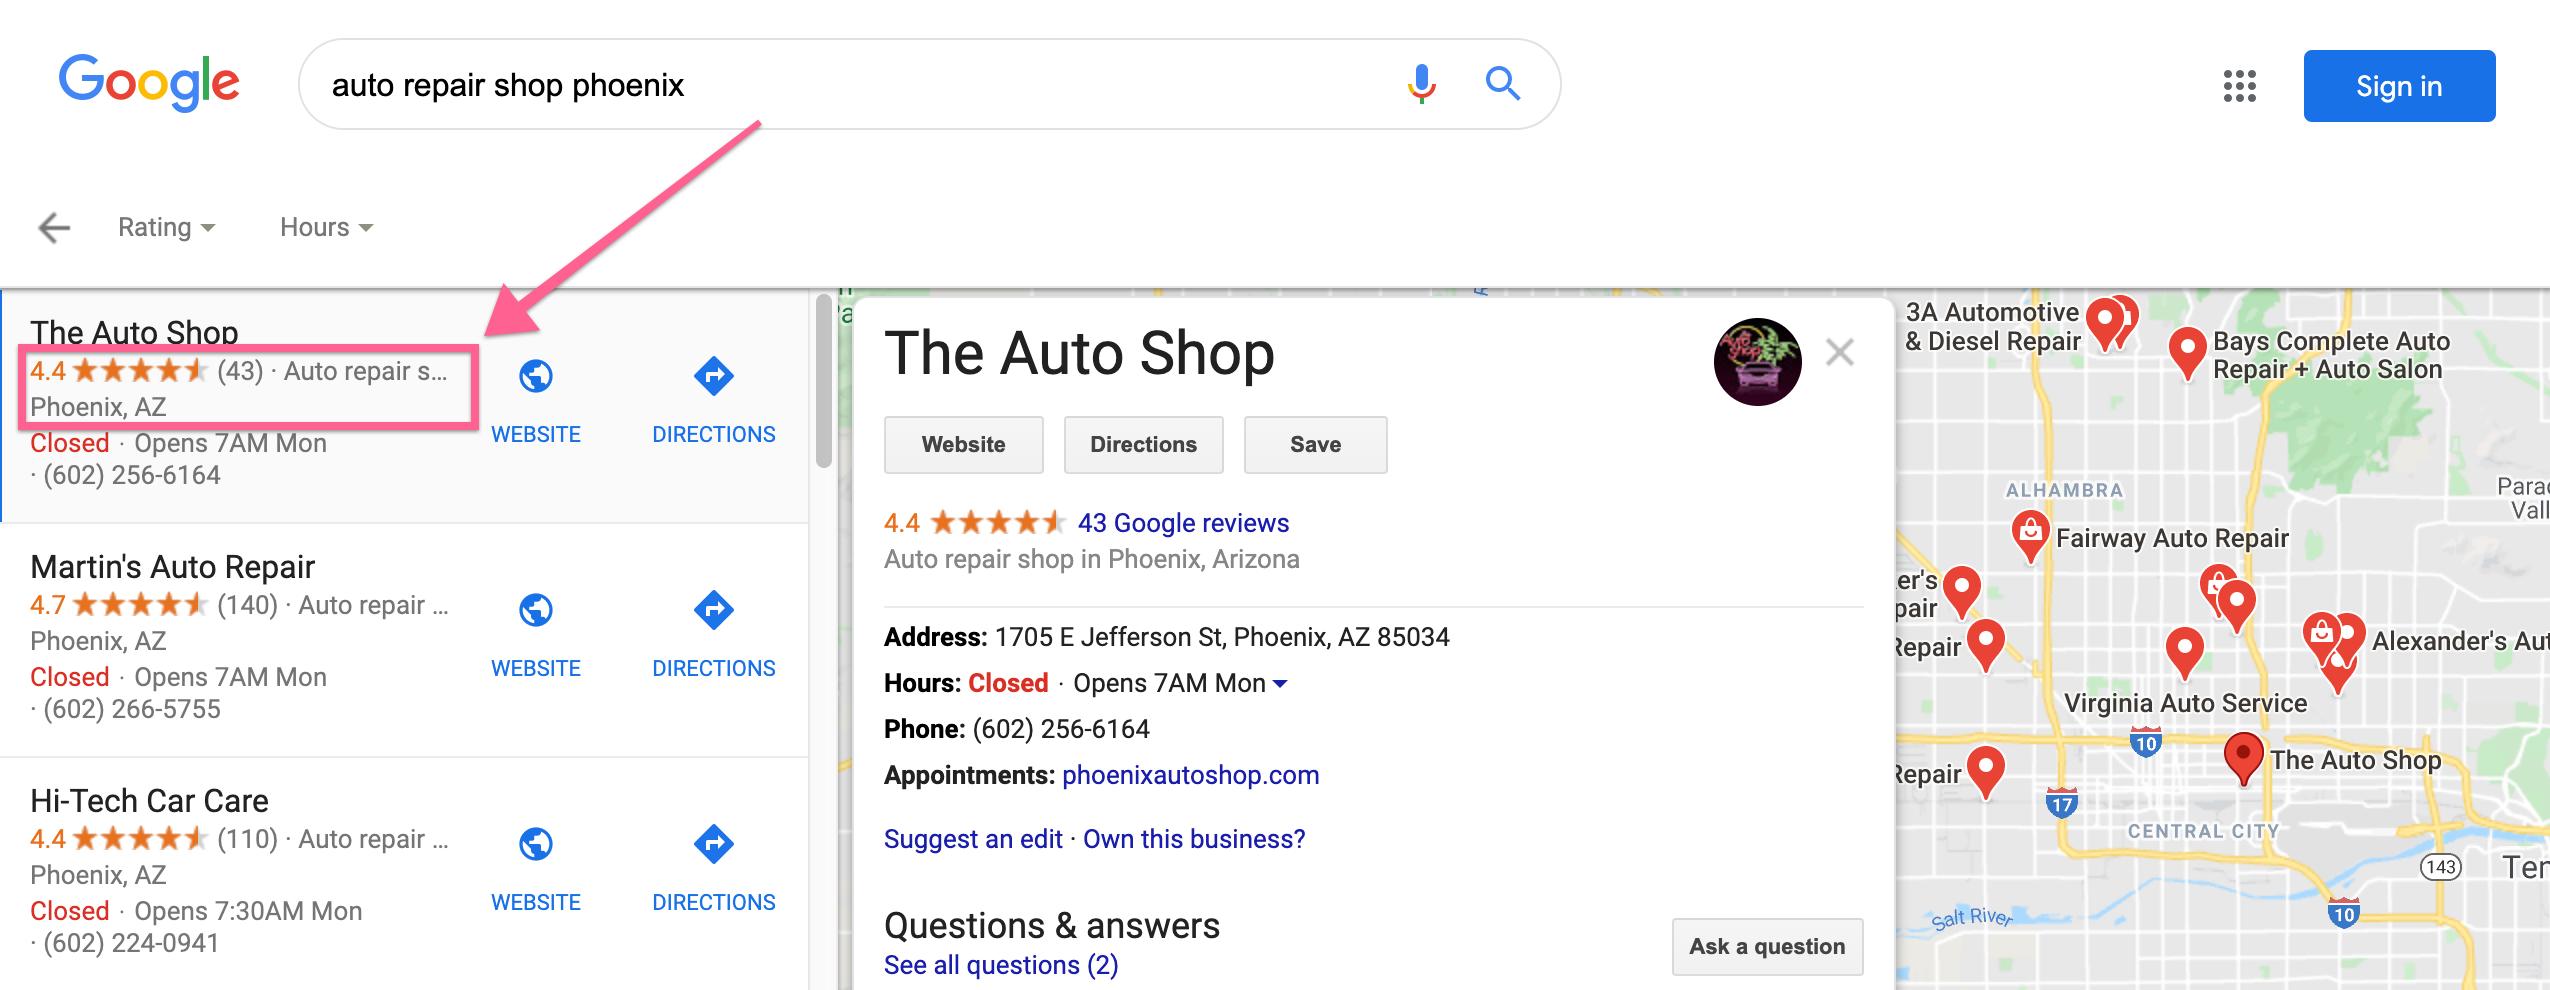 Auto repair shops in Pheonix, AZ